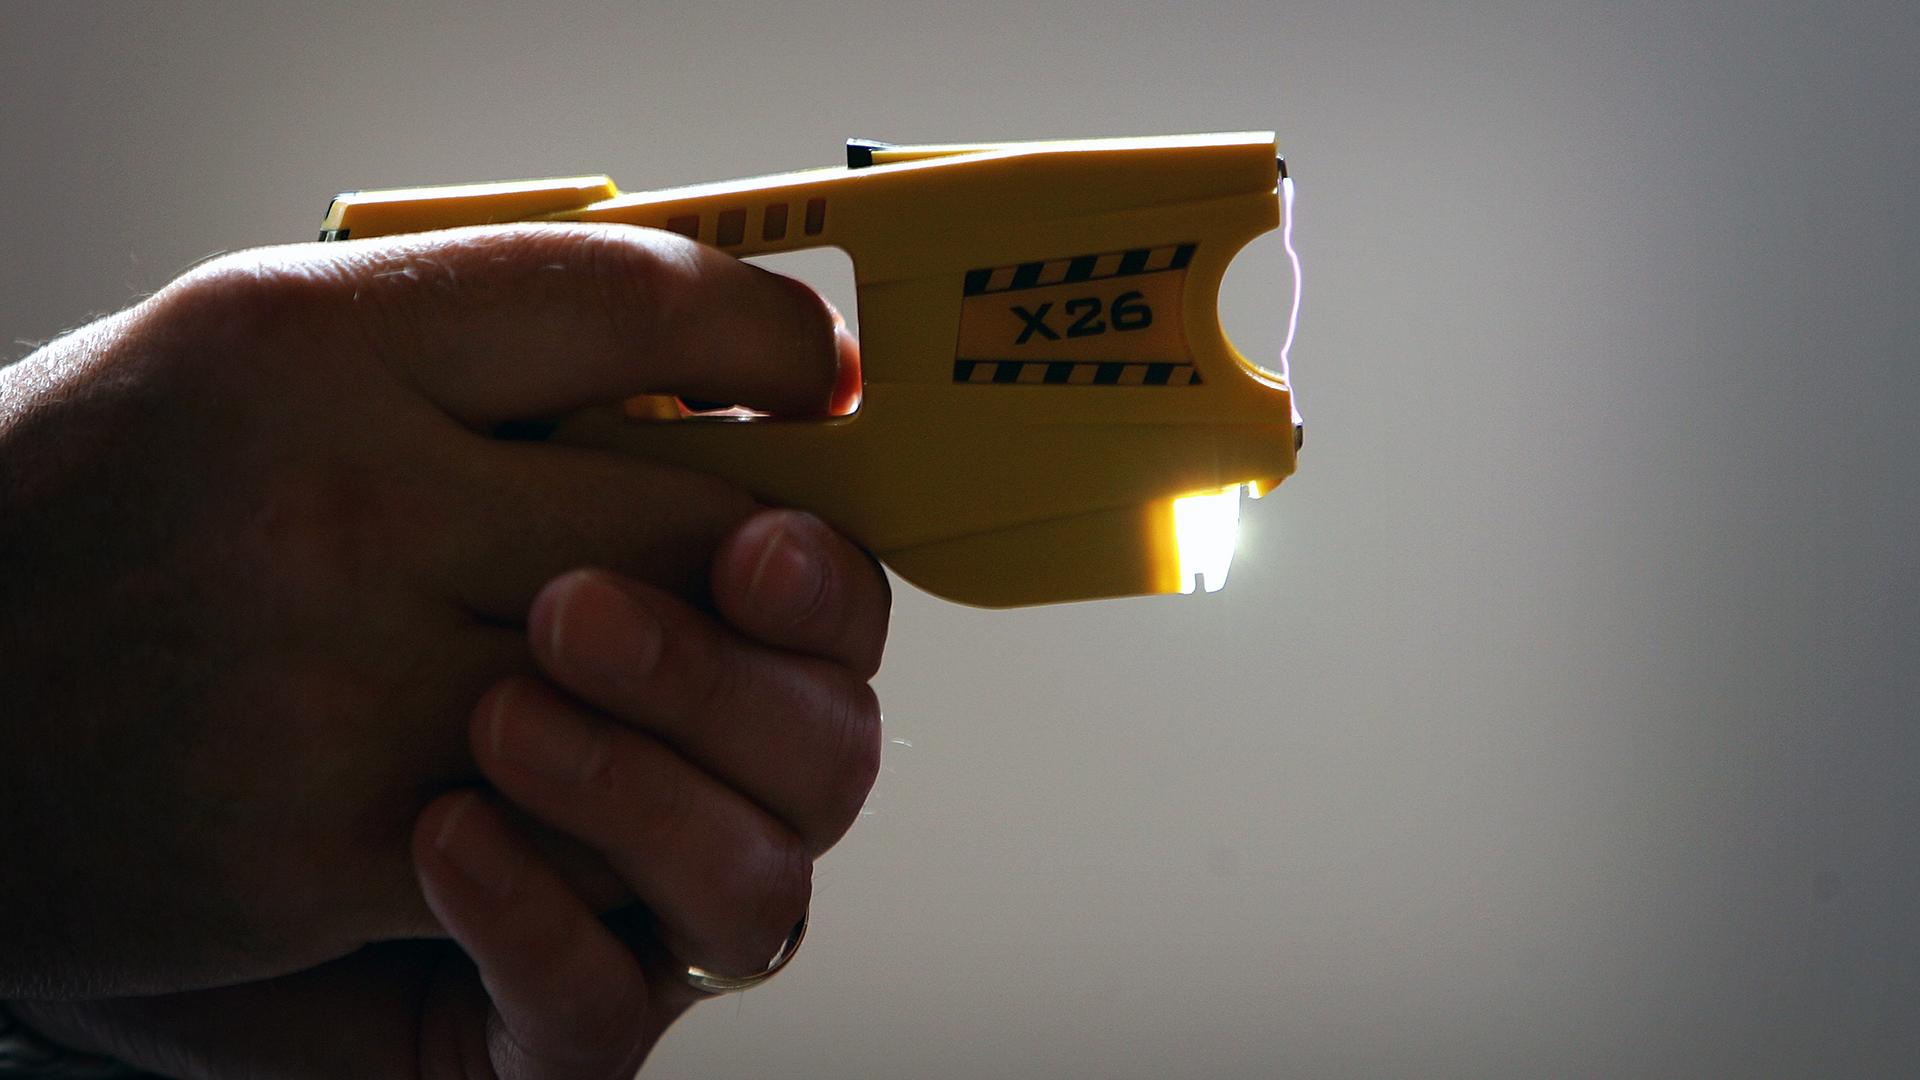 Taser X26 stun gun-159532.jpg71111501